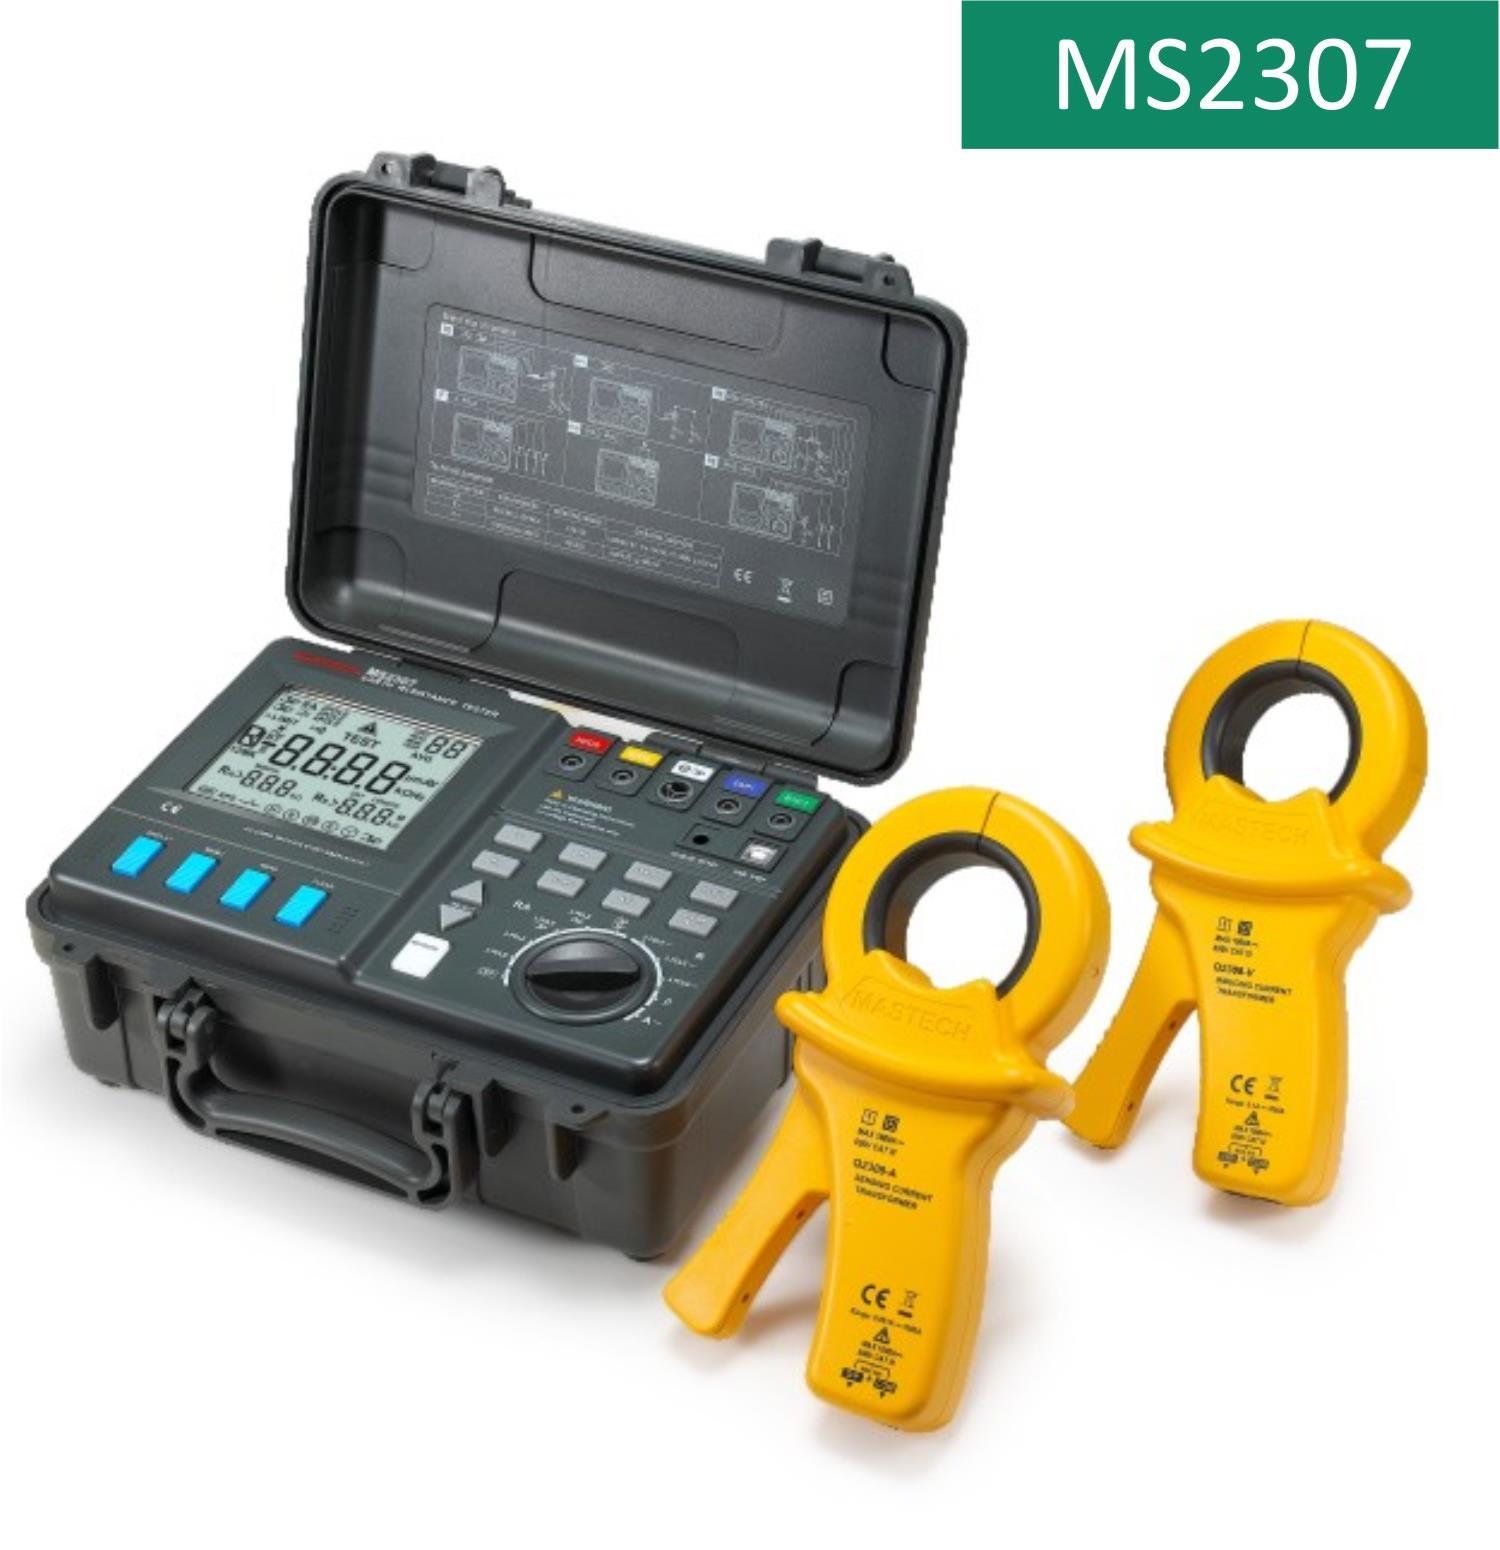 MS2307